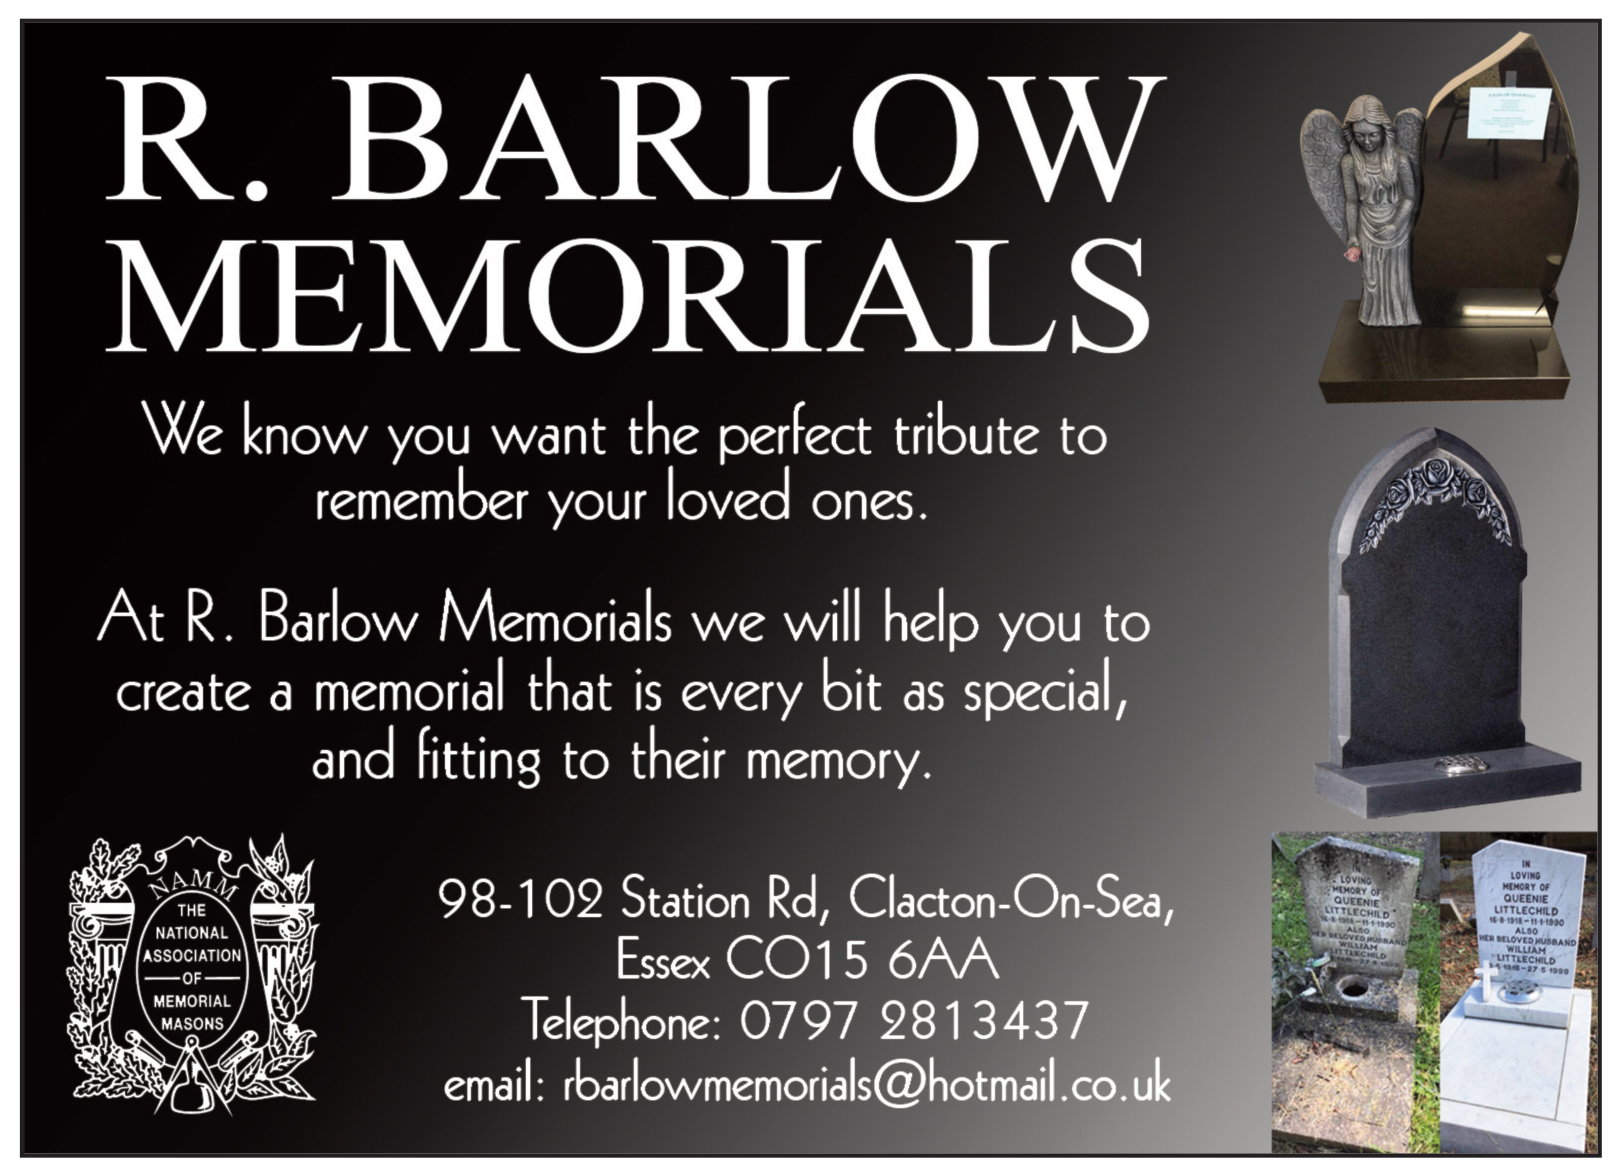 R. Barlow Memorials